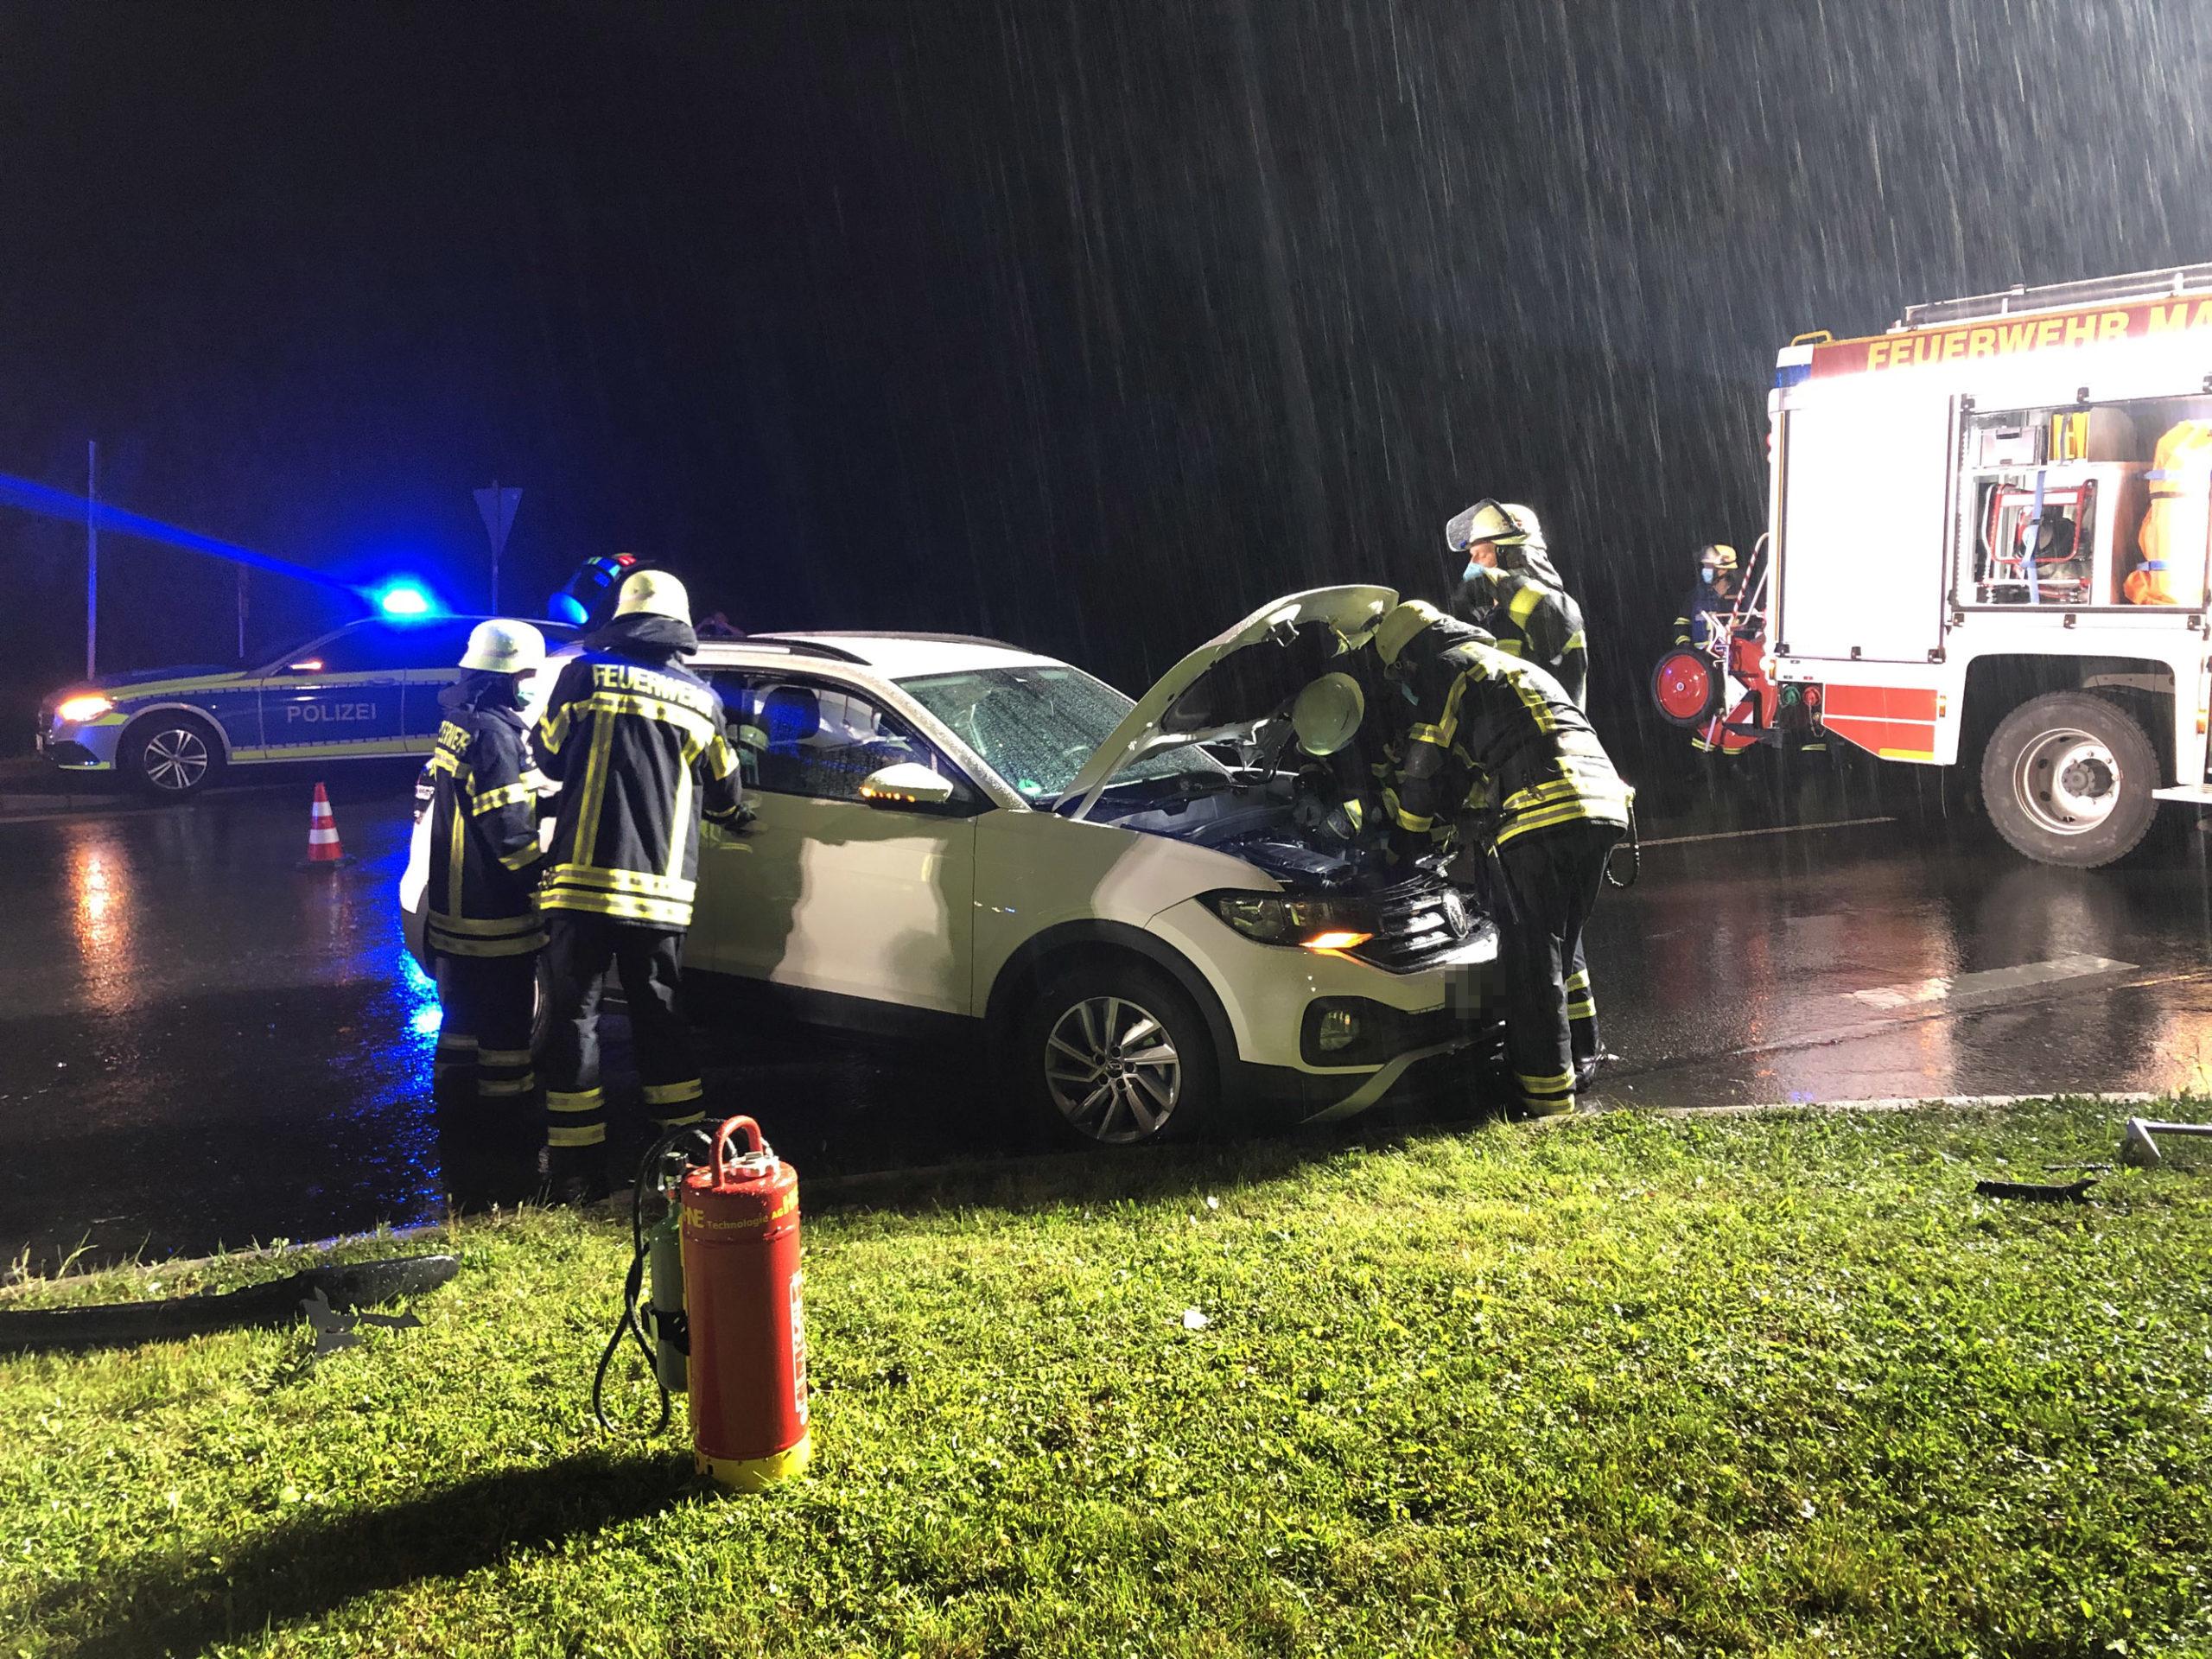 H 1 VU – Verkehrsunfall mit zwei PKW vor Feuerwehrhaus